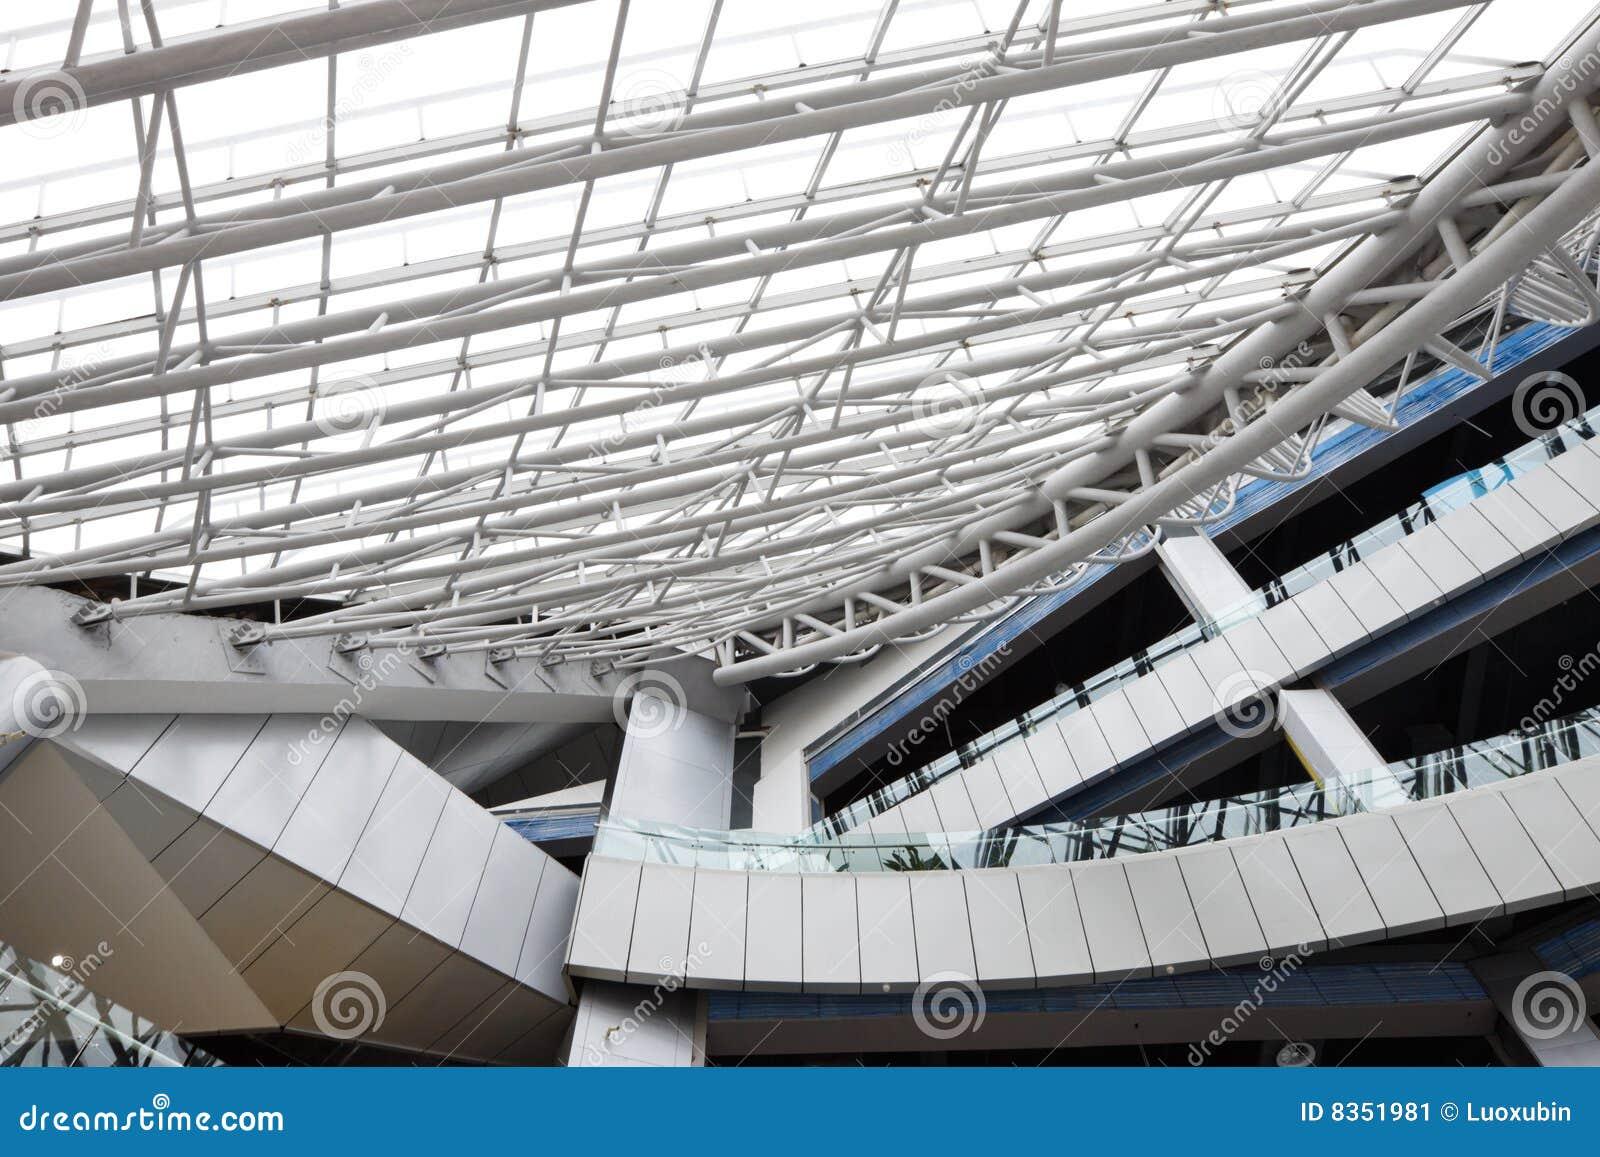 Interior Building Structure Design Stock Image